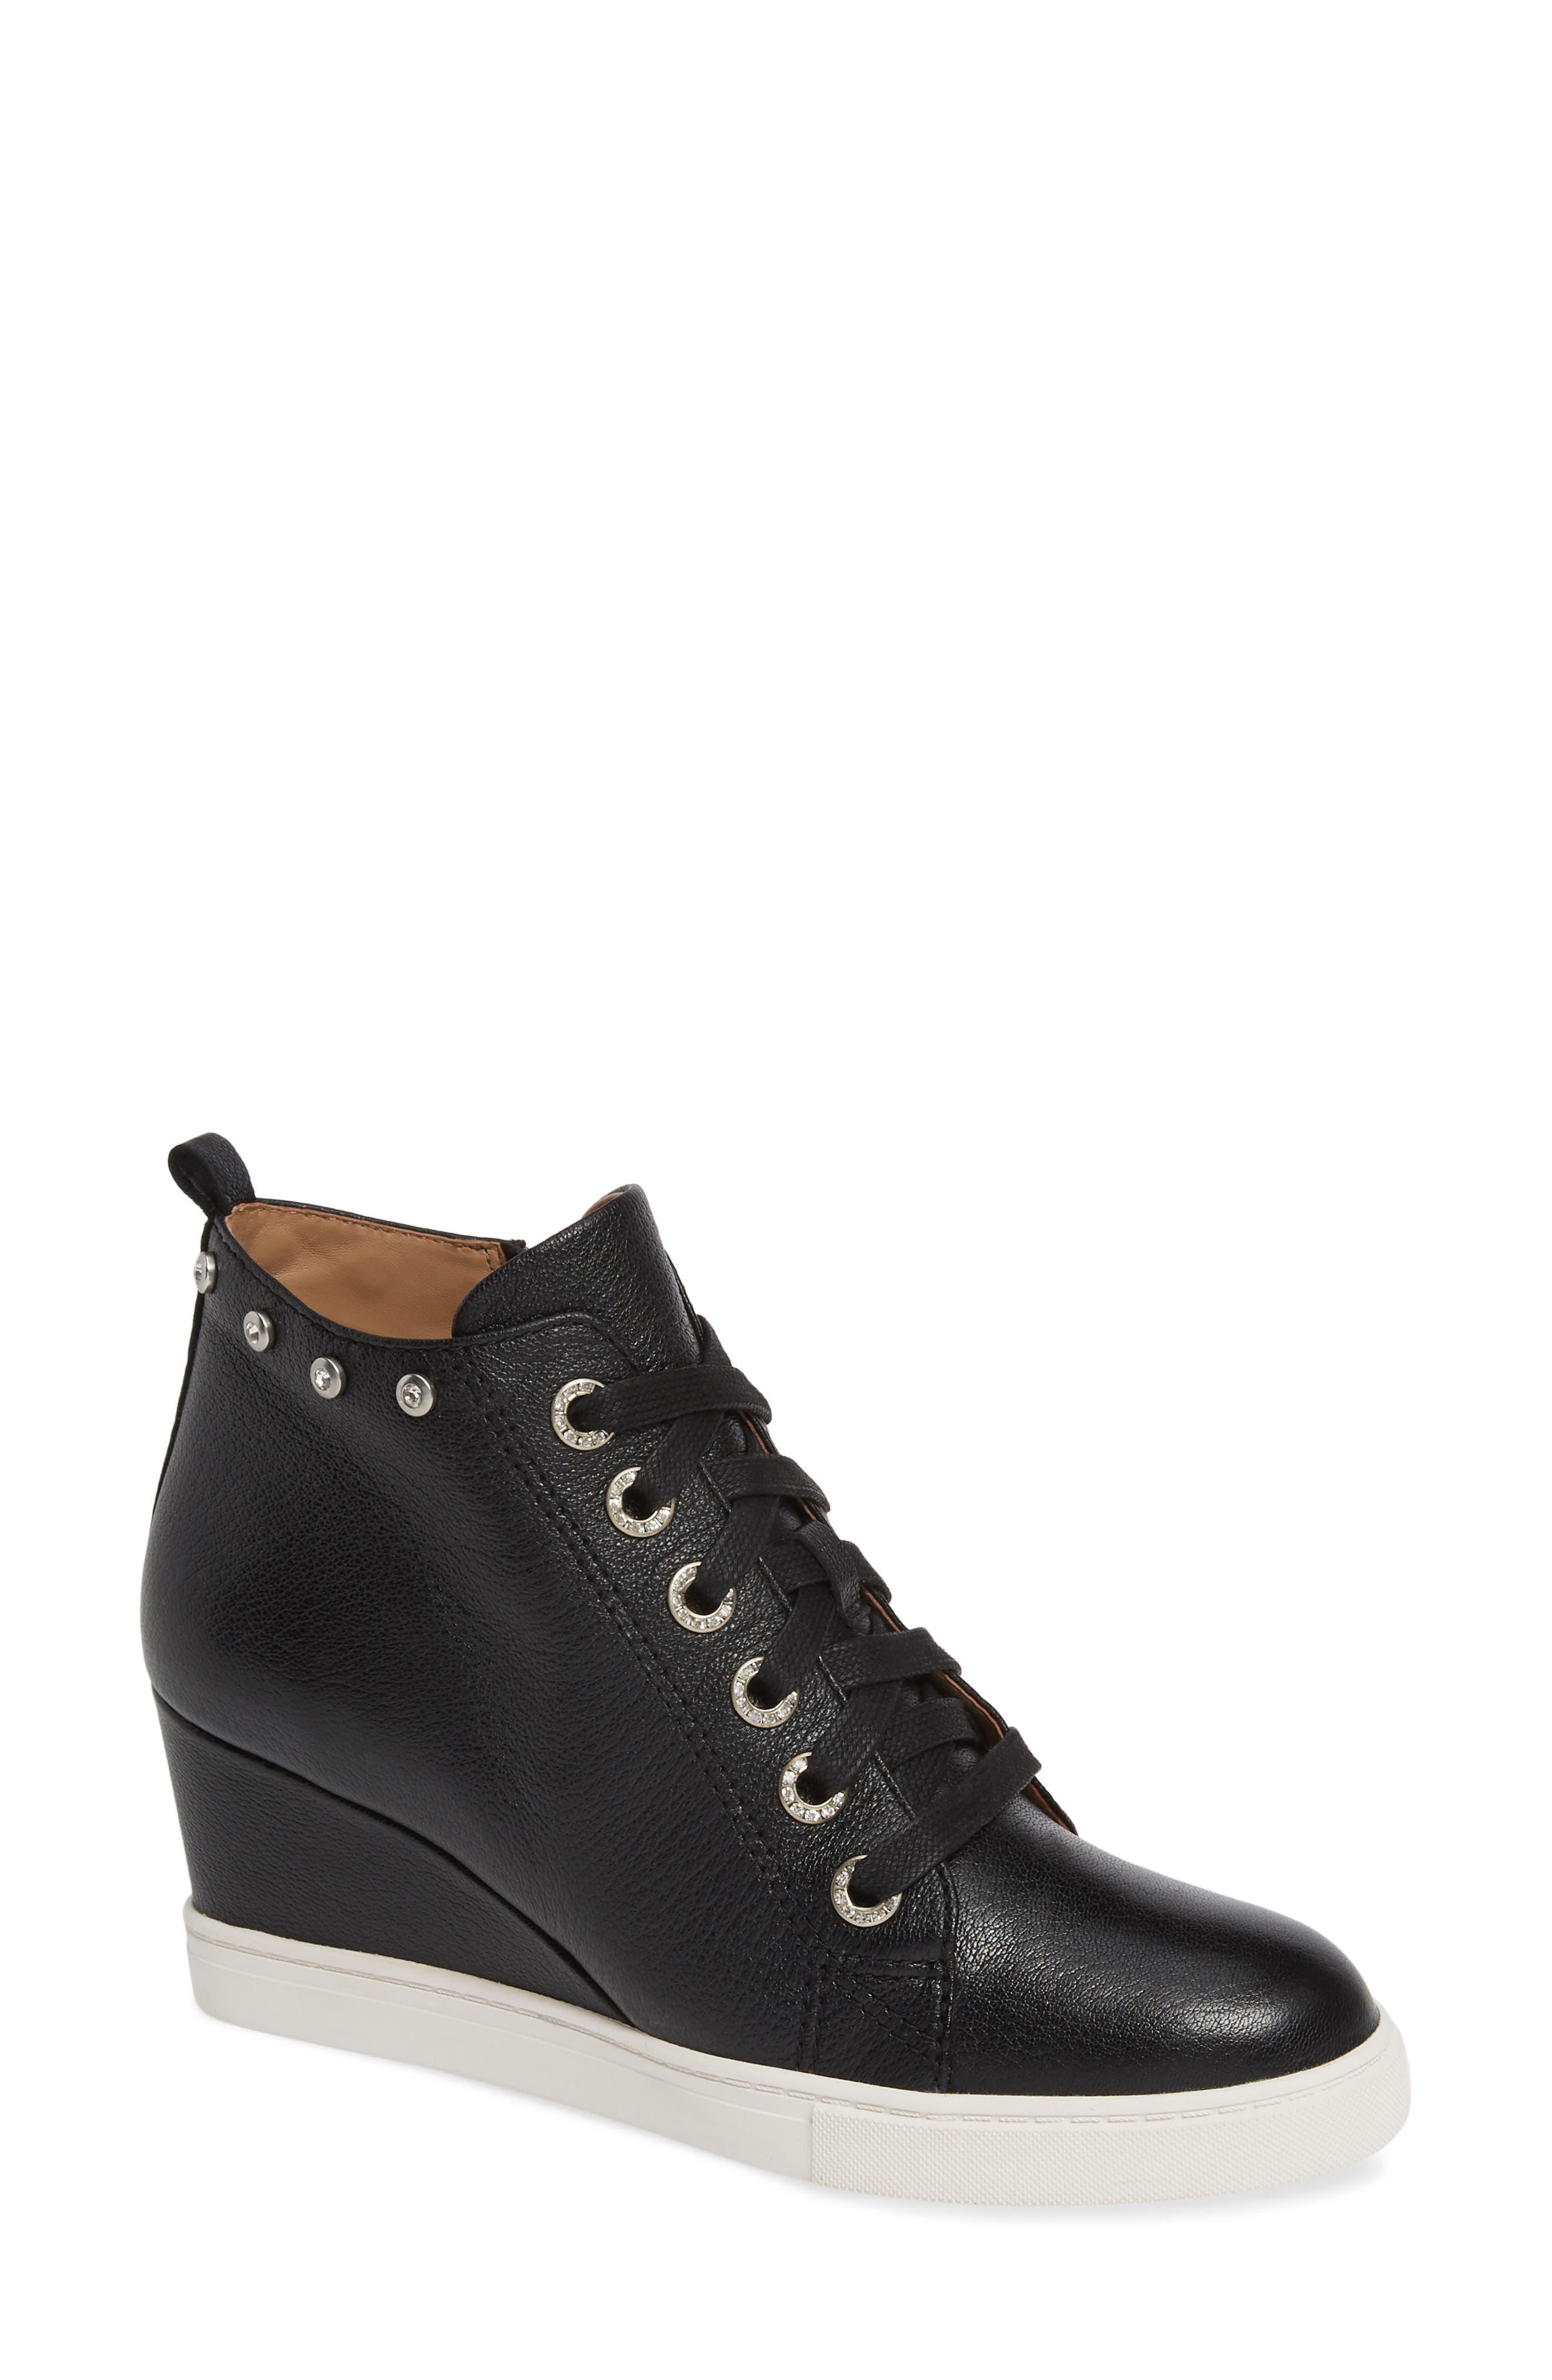 LINEA PAOLO Flint Wedge Sneaker, Main, color, BLACK LEATHER